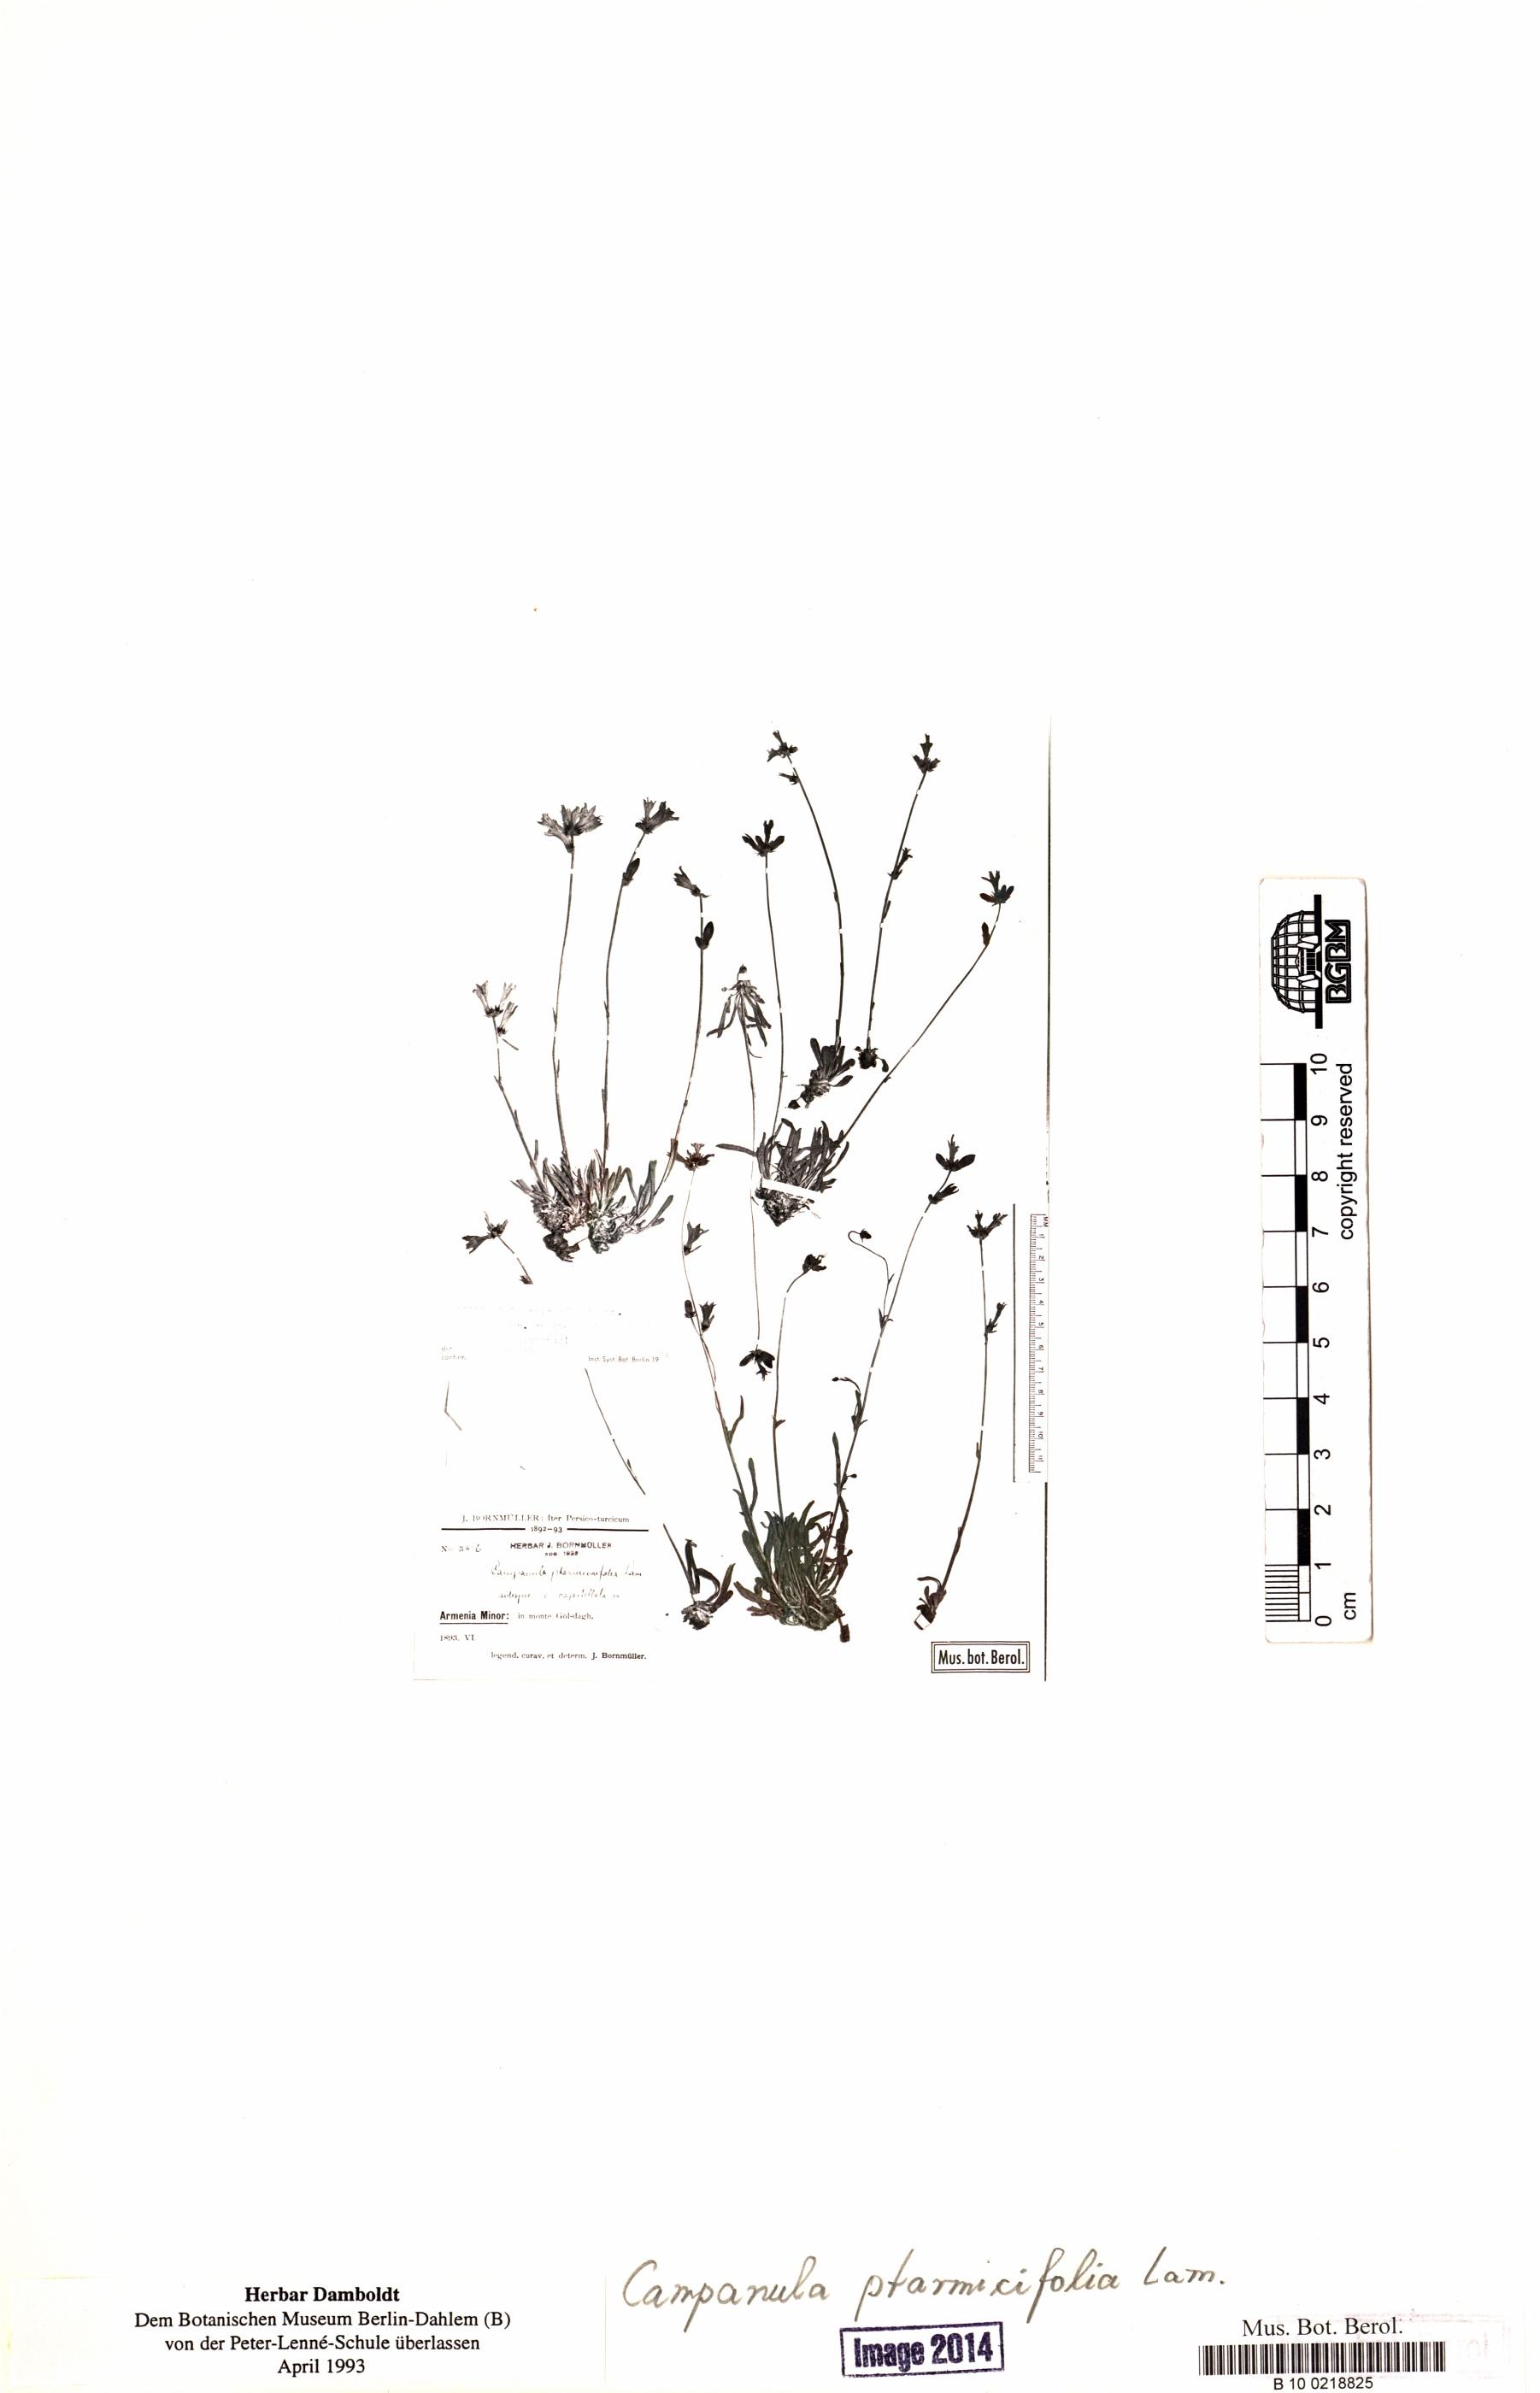 http://ww2.bgbm.org/herbarium/images/B/10/02/18/82/B_10_0218825.jpg